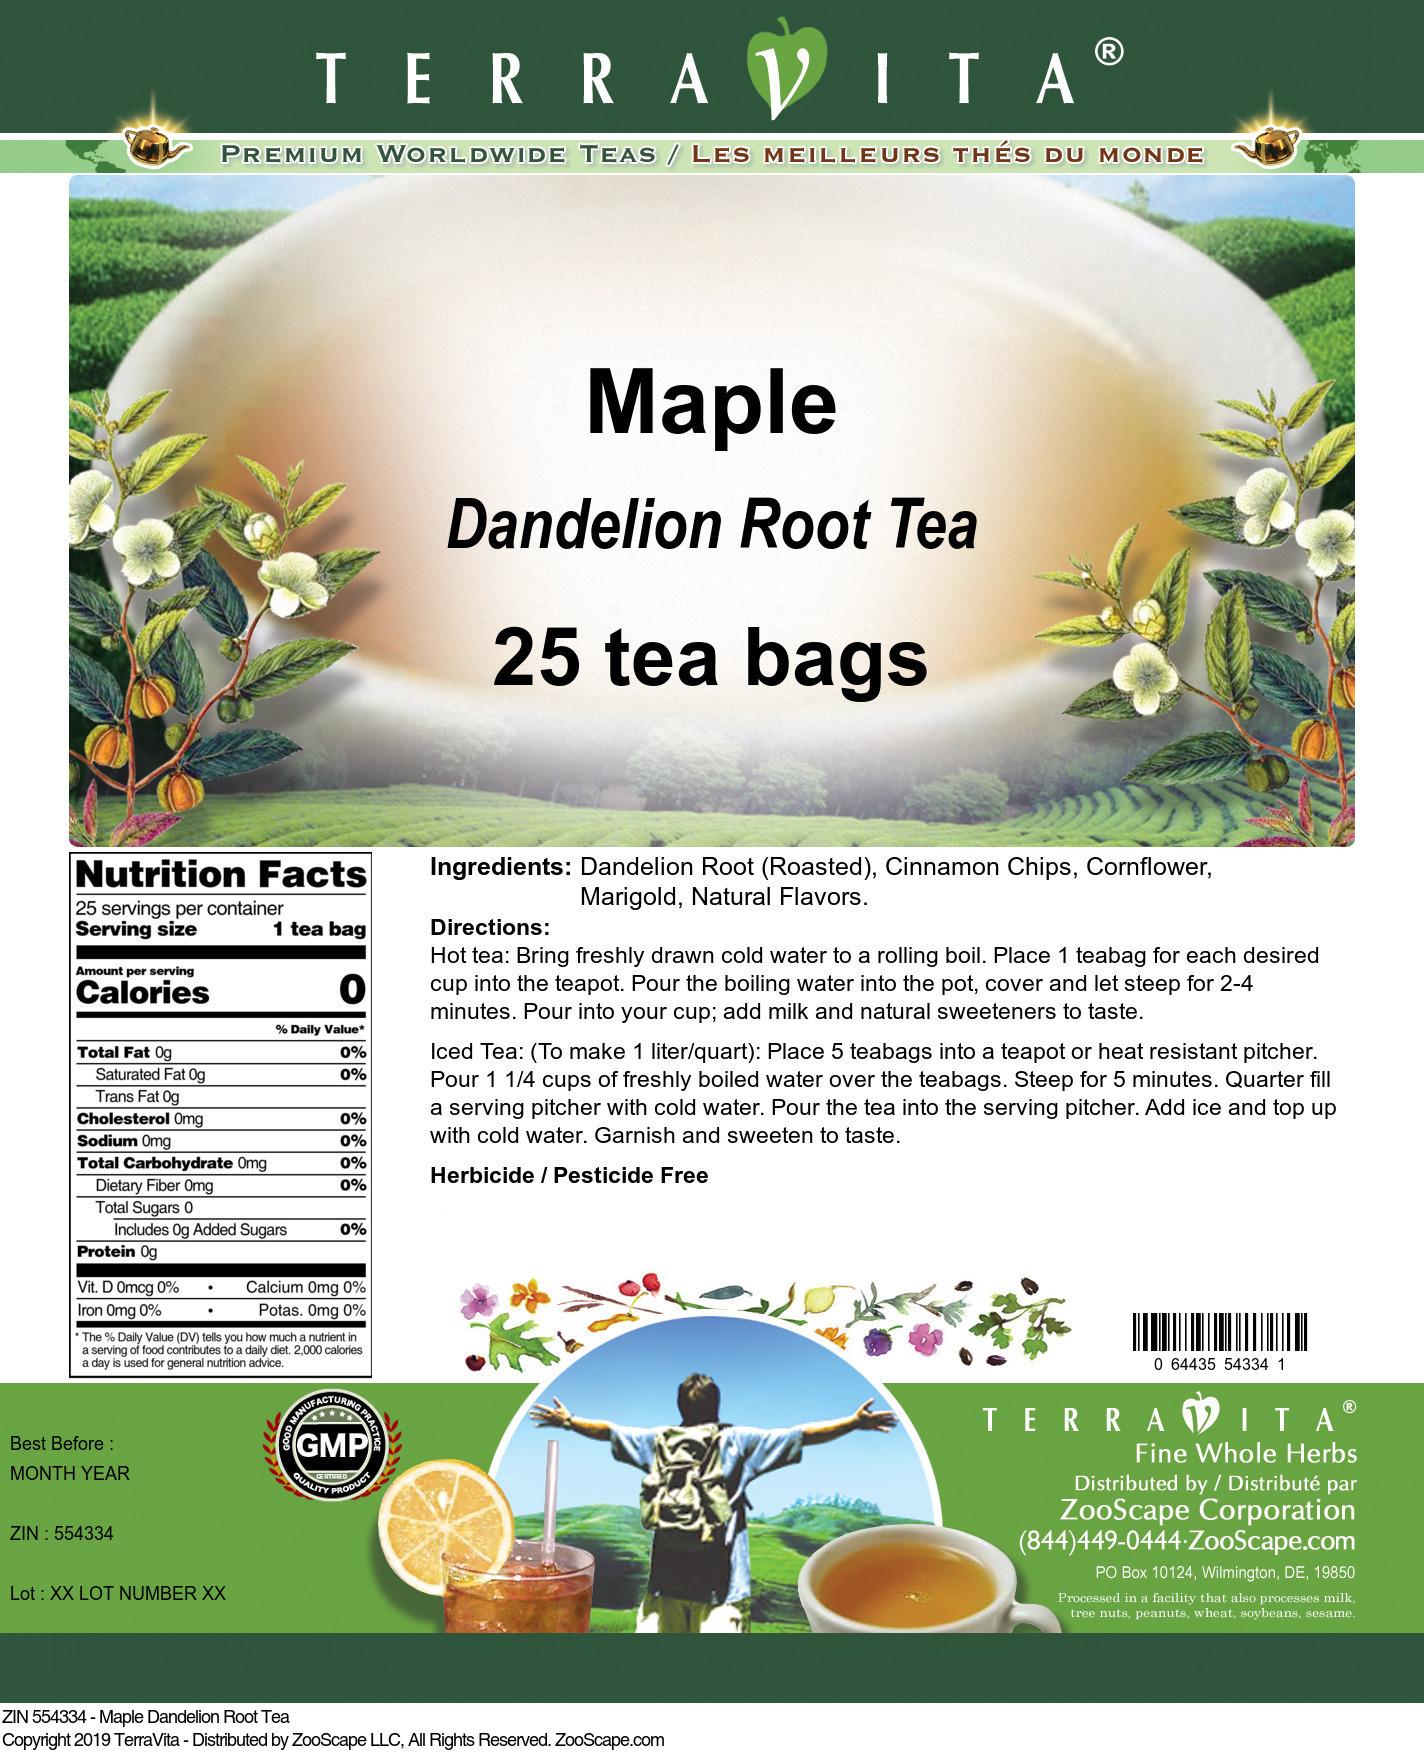 Maple Dandelion Root Tea